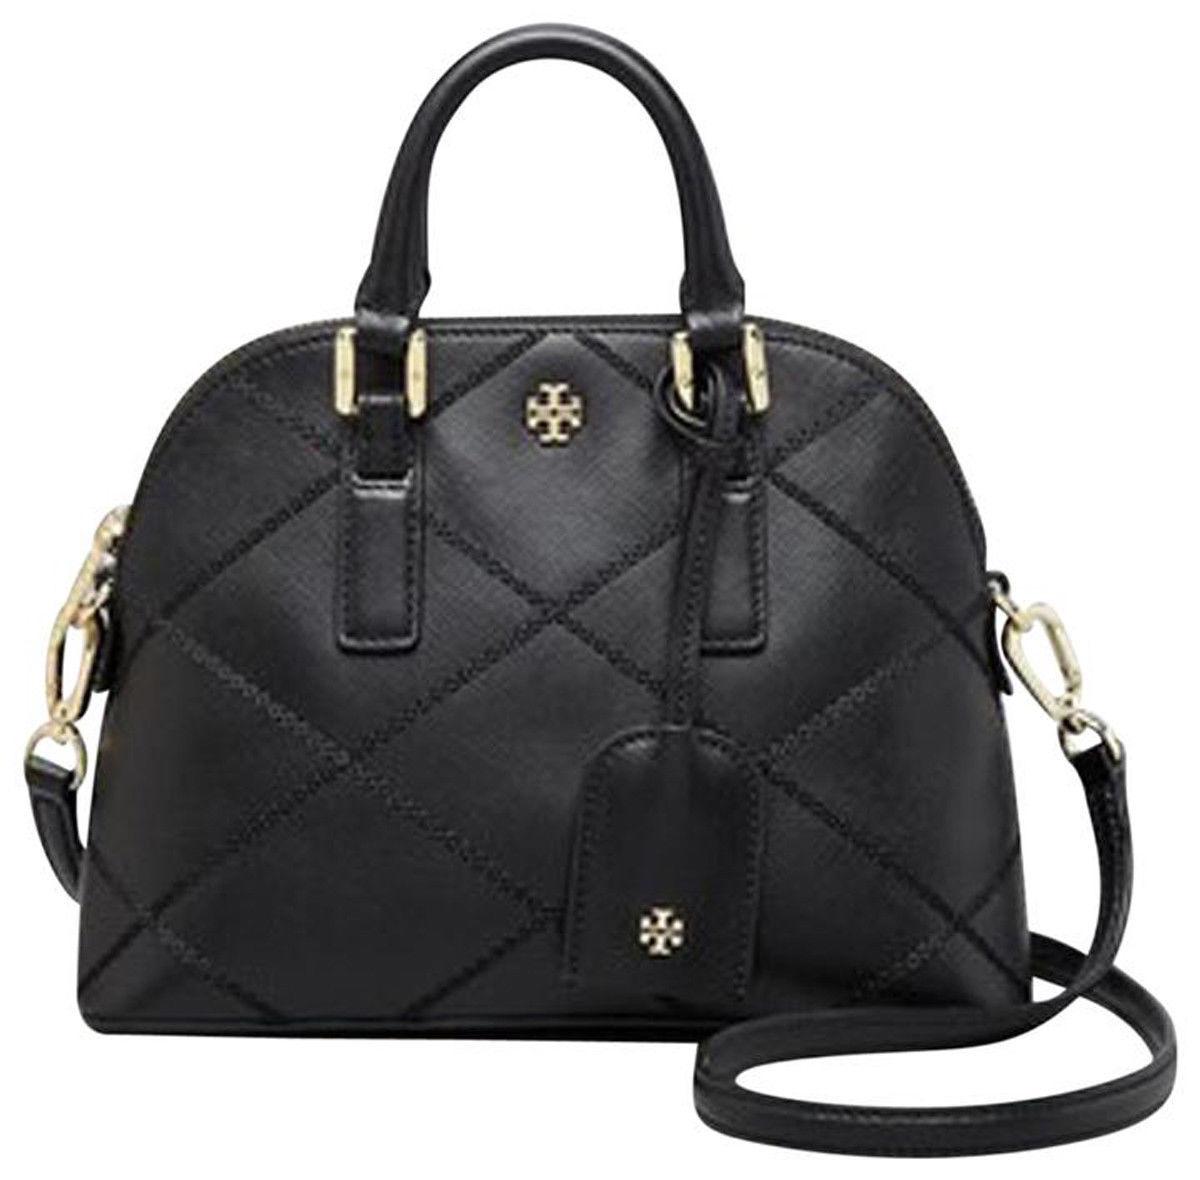 NWT Tory Burch Black Saffiano Mini Robinson Stitched Dome Cross Body Bag  - $425 image 5